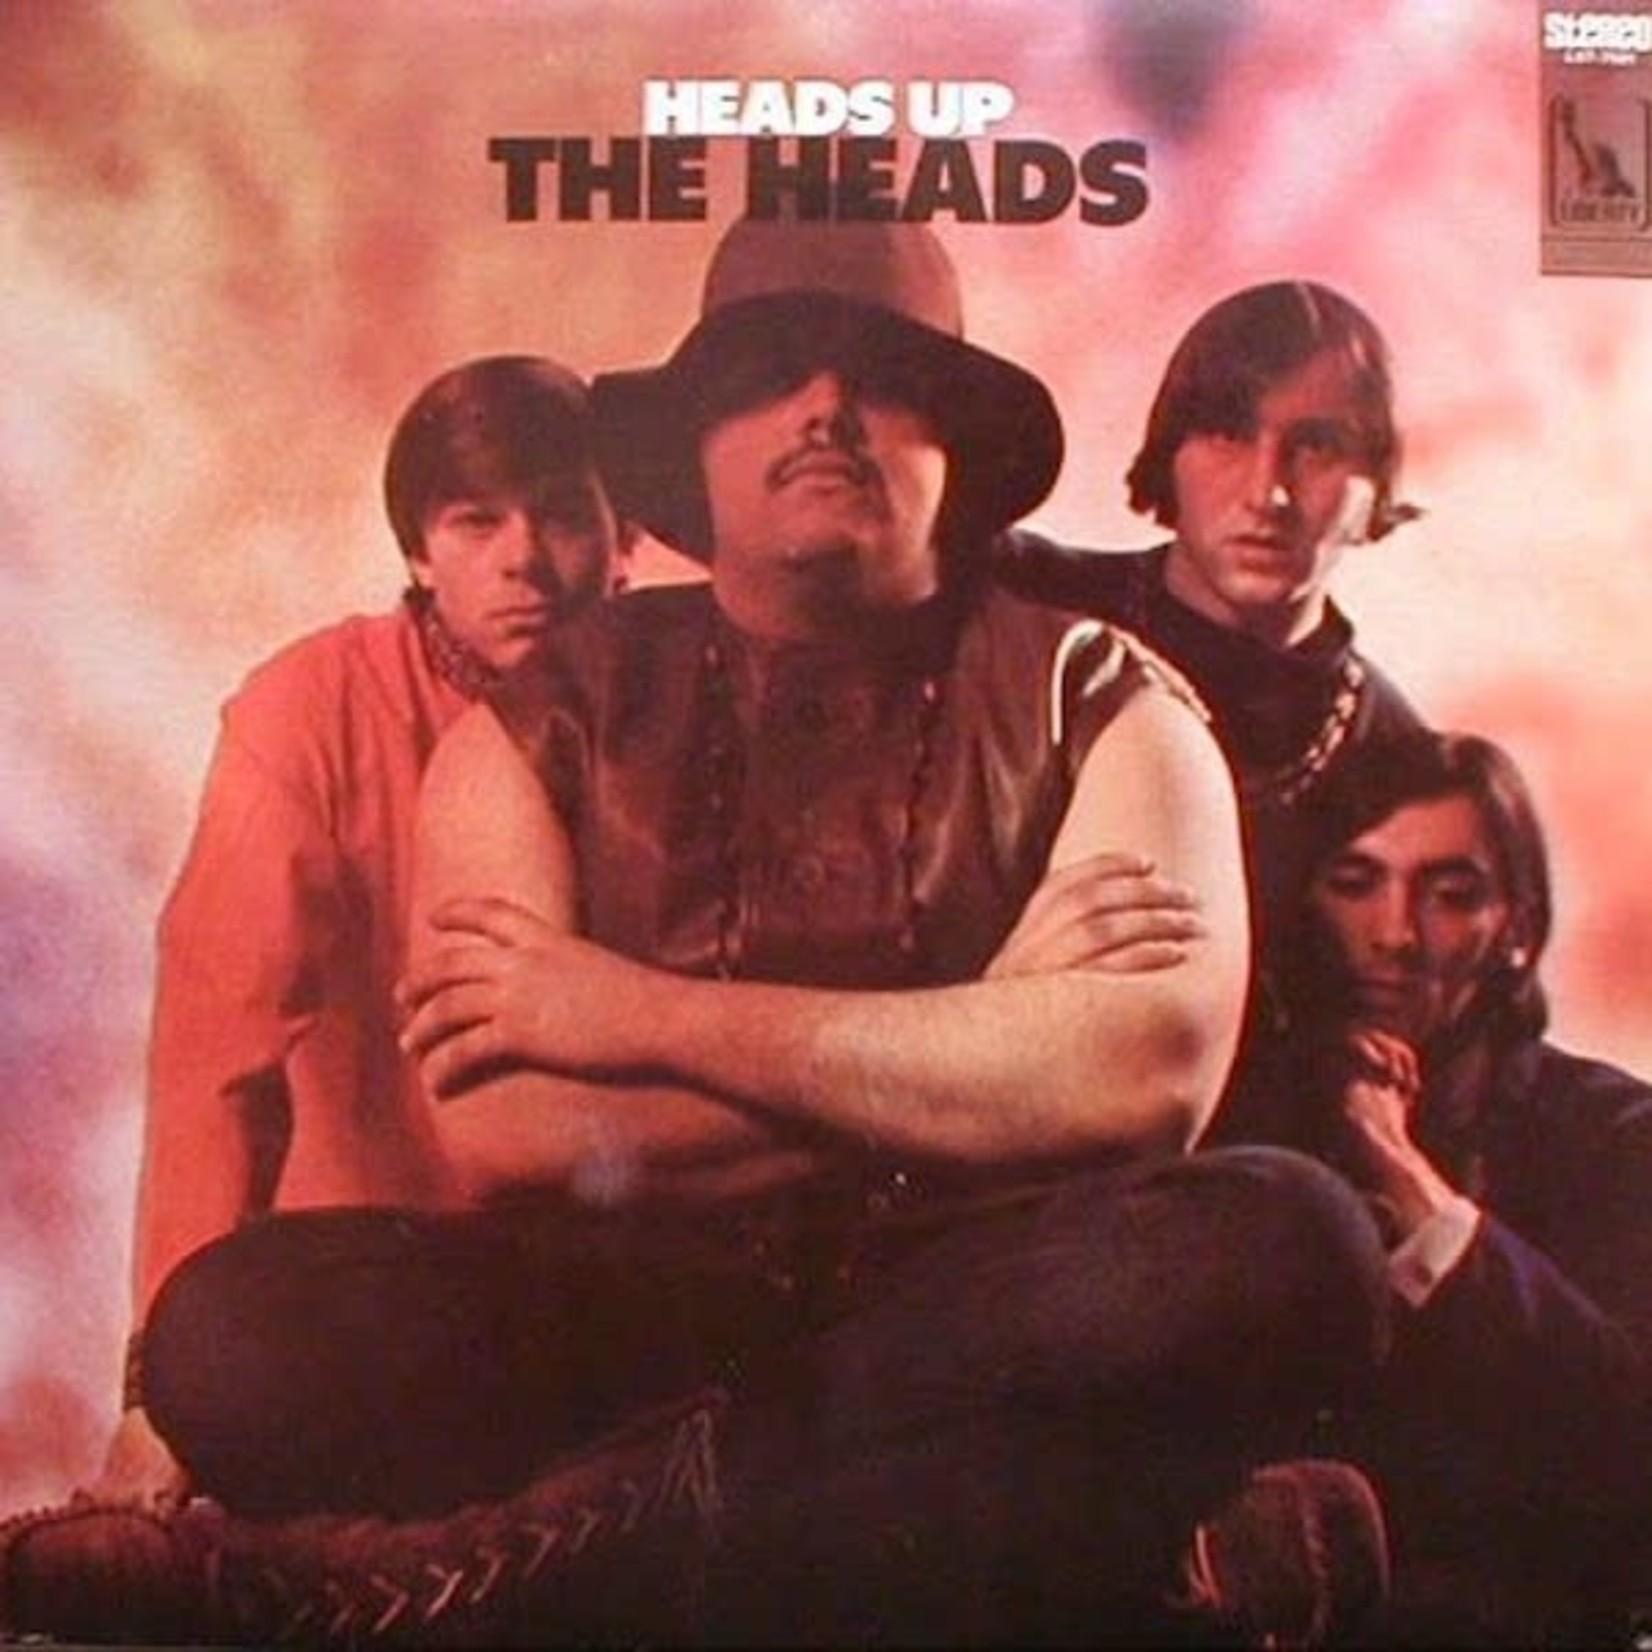 Vinyl The Heads - Heads Up